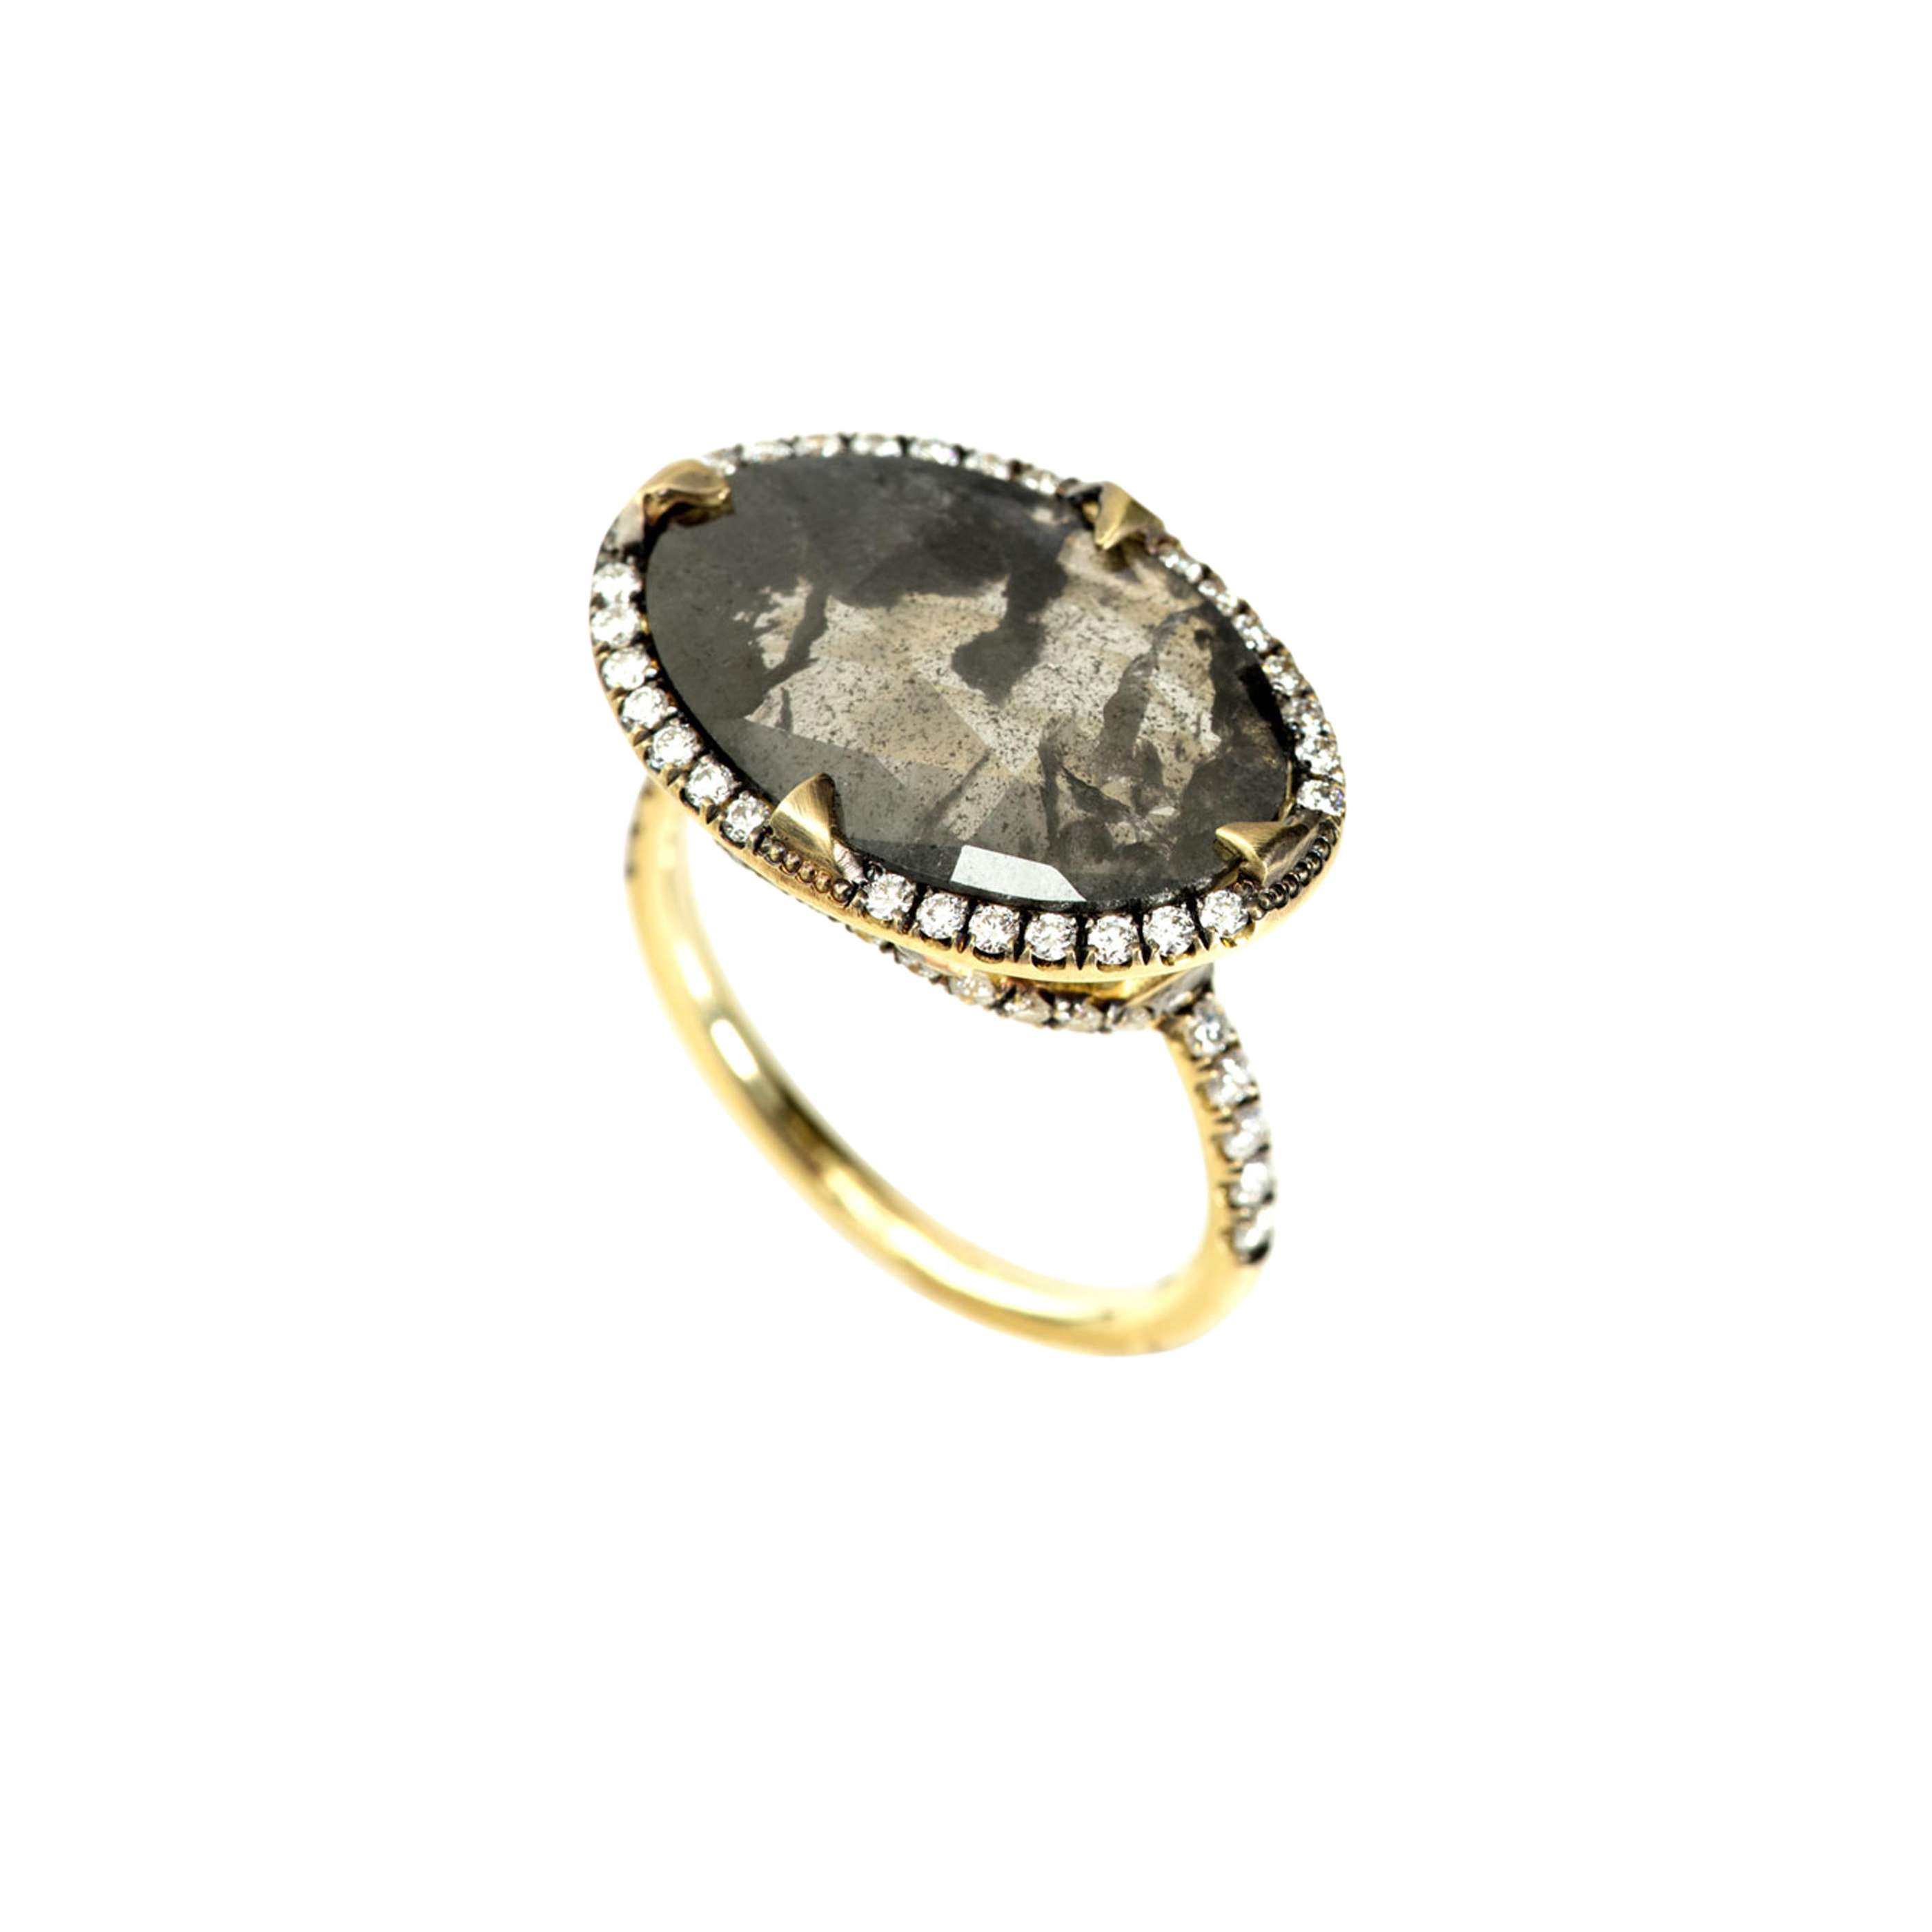 SYLVA & CIE 18K Yellow Gold Rough Diamond Ring